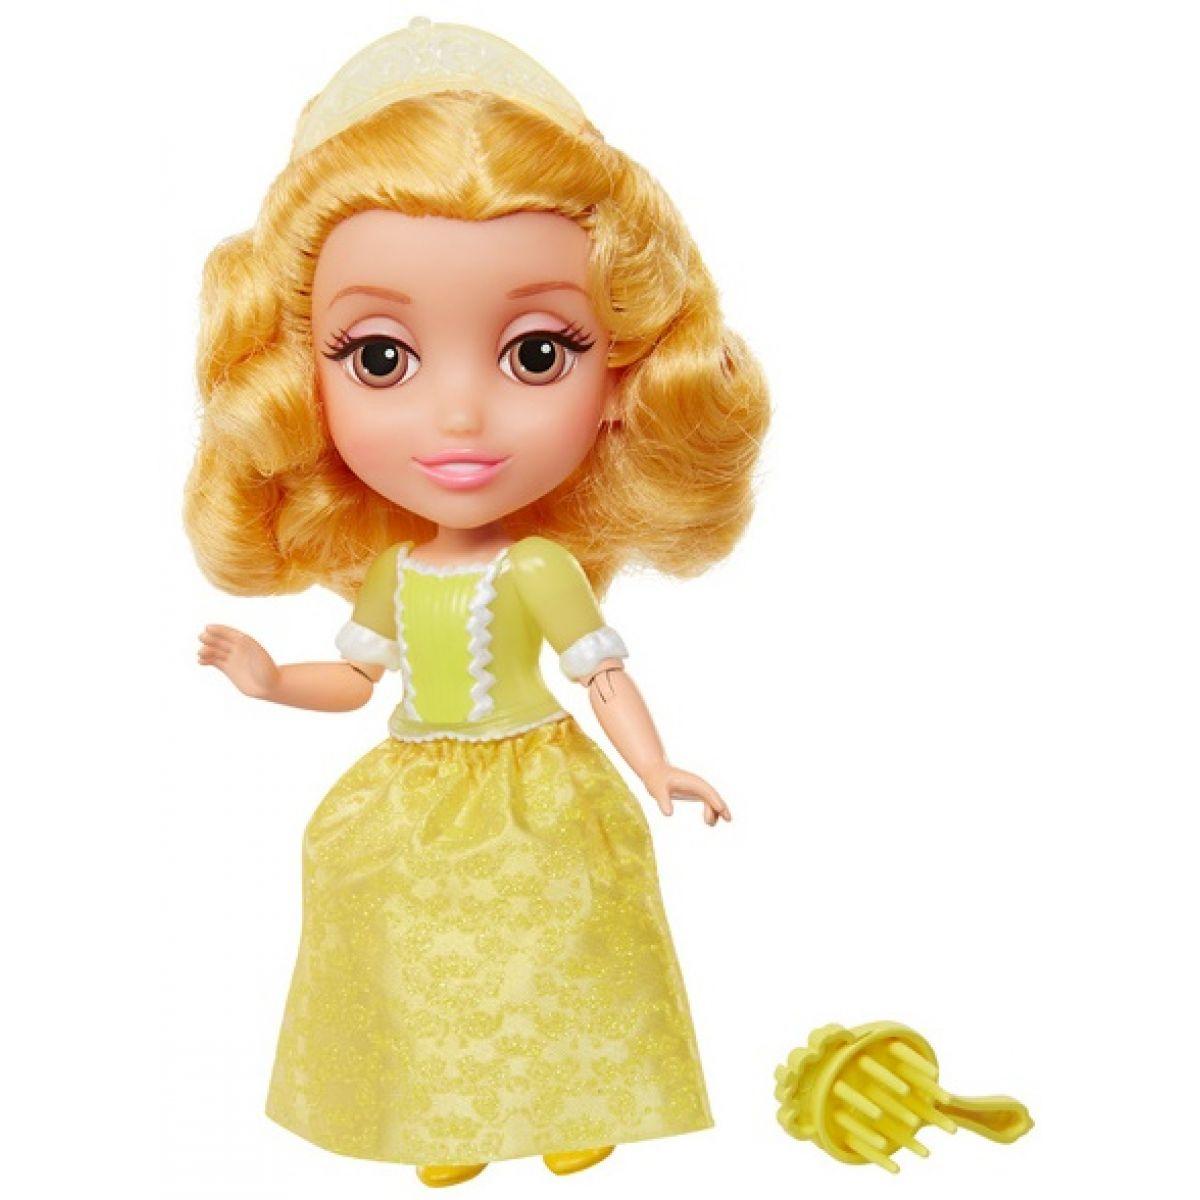 Jakks Pacific Disney Princezna 15cm - Princezna Amber ve žlutém